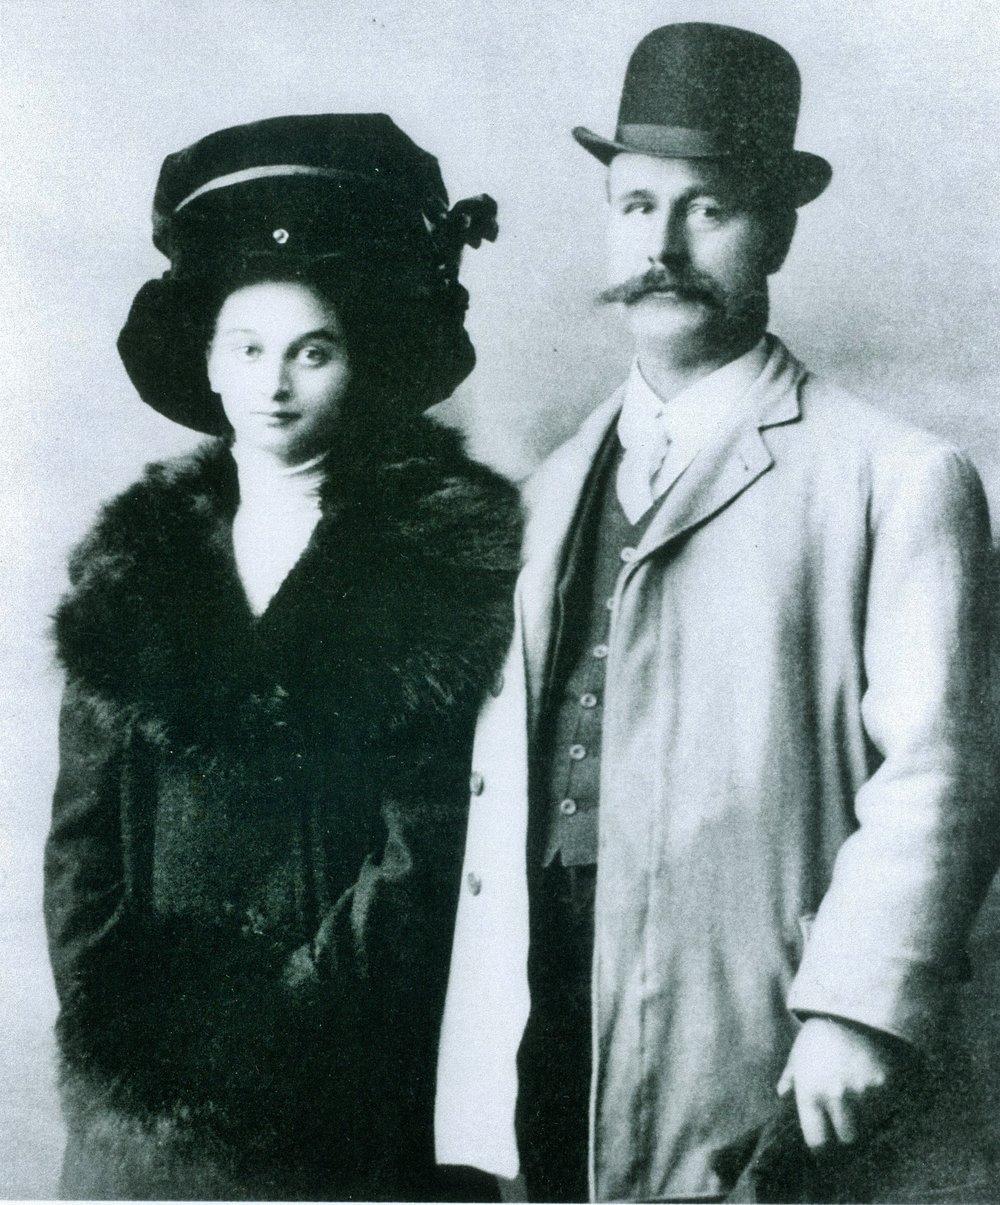 Lycurgus McMillian/Sarah Nobes 1911